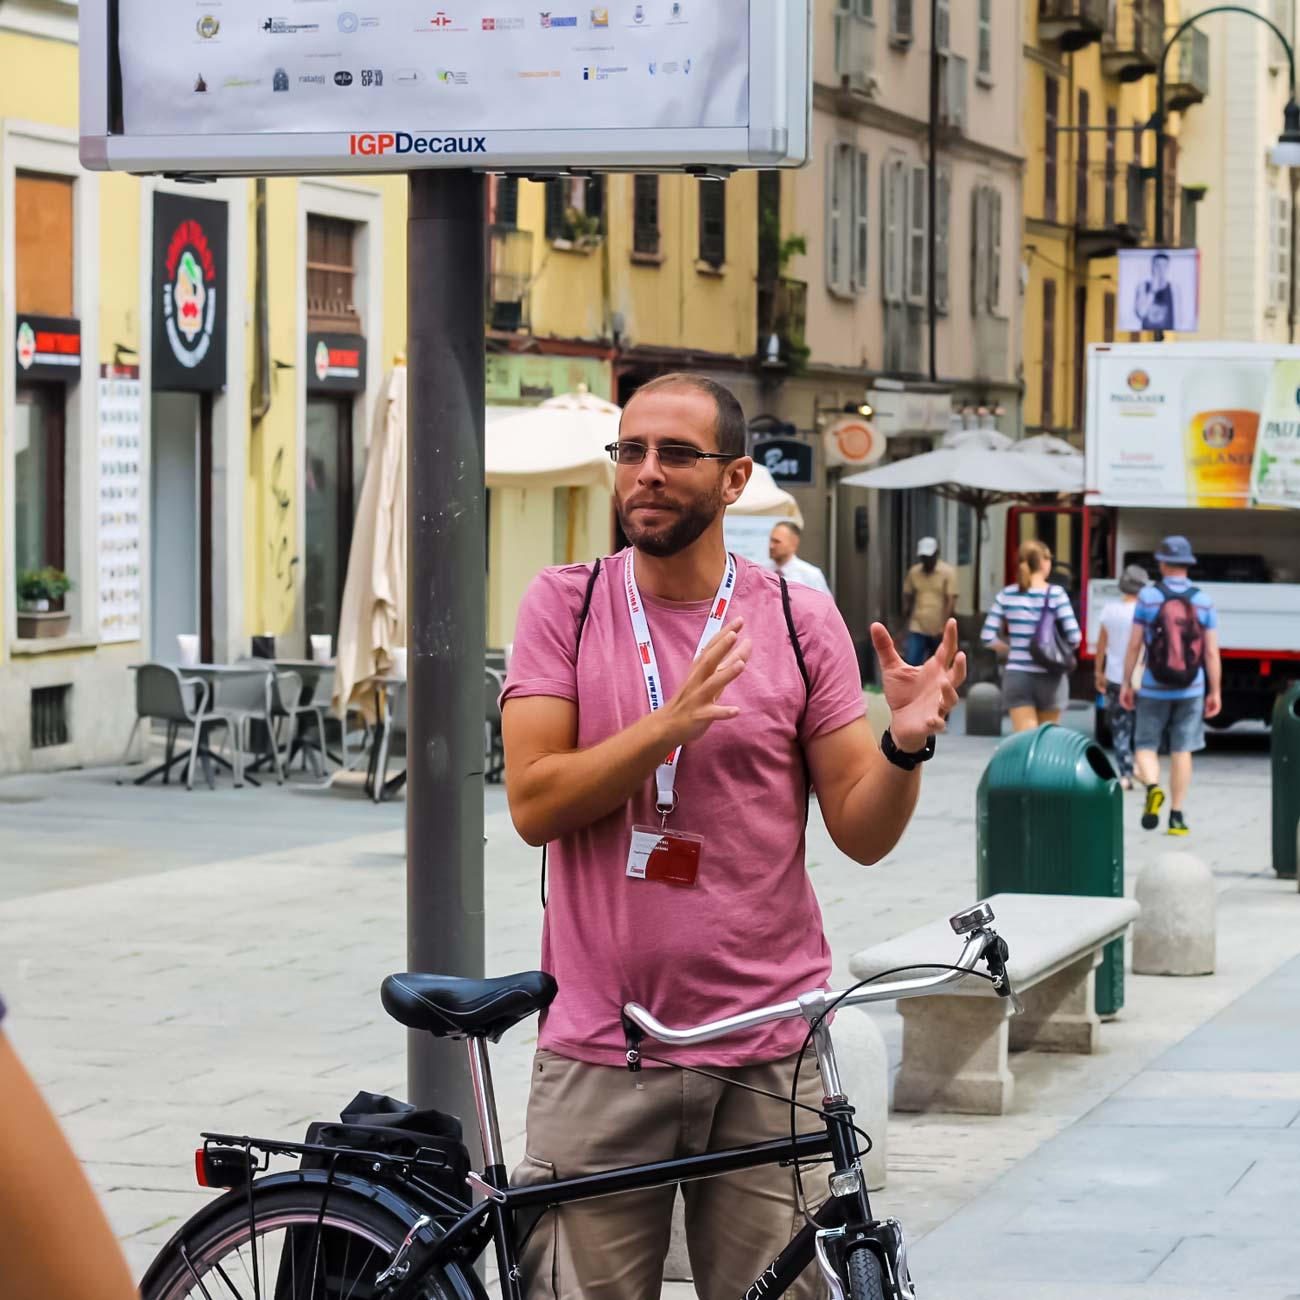 bike-and-the-city-tour-bicicletta-milano-roma-verona-64